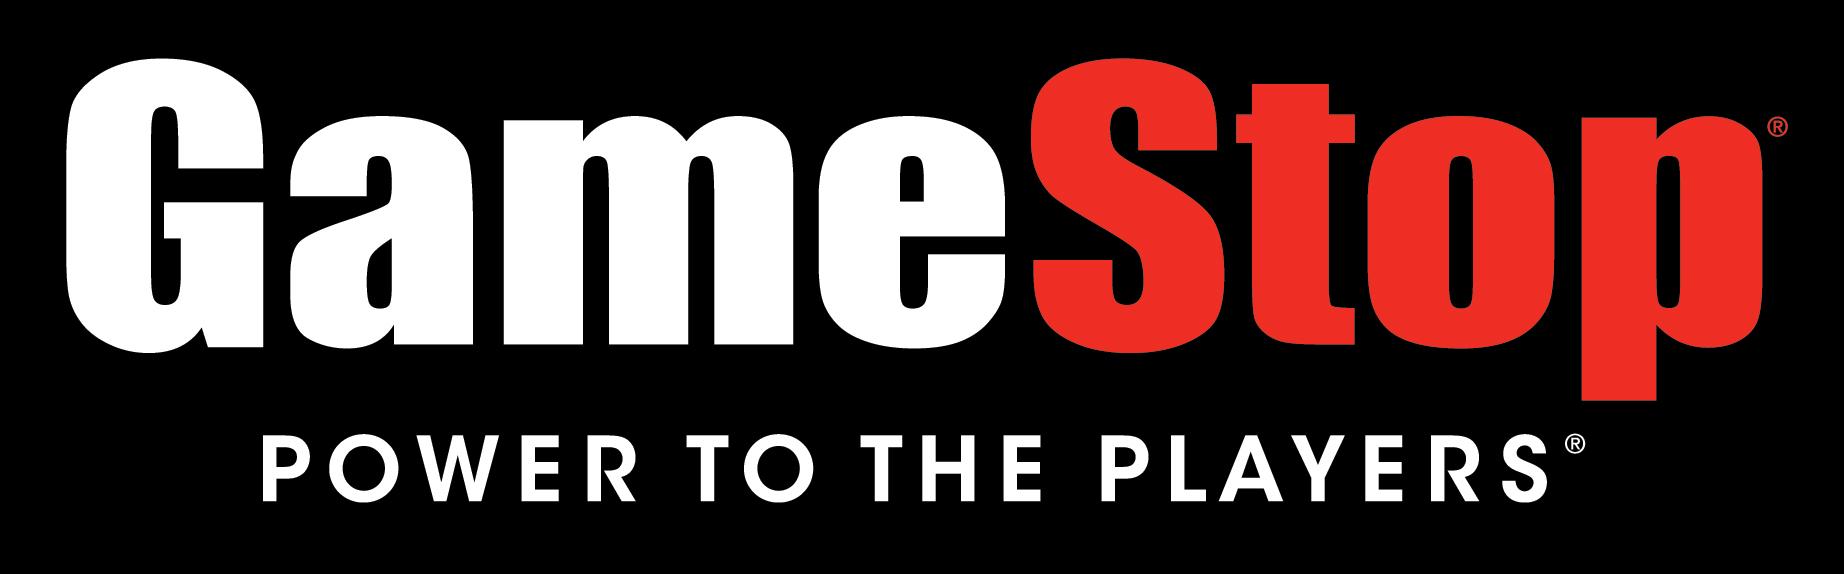 gamestop chiusura 150 punti vendita